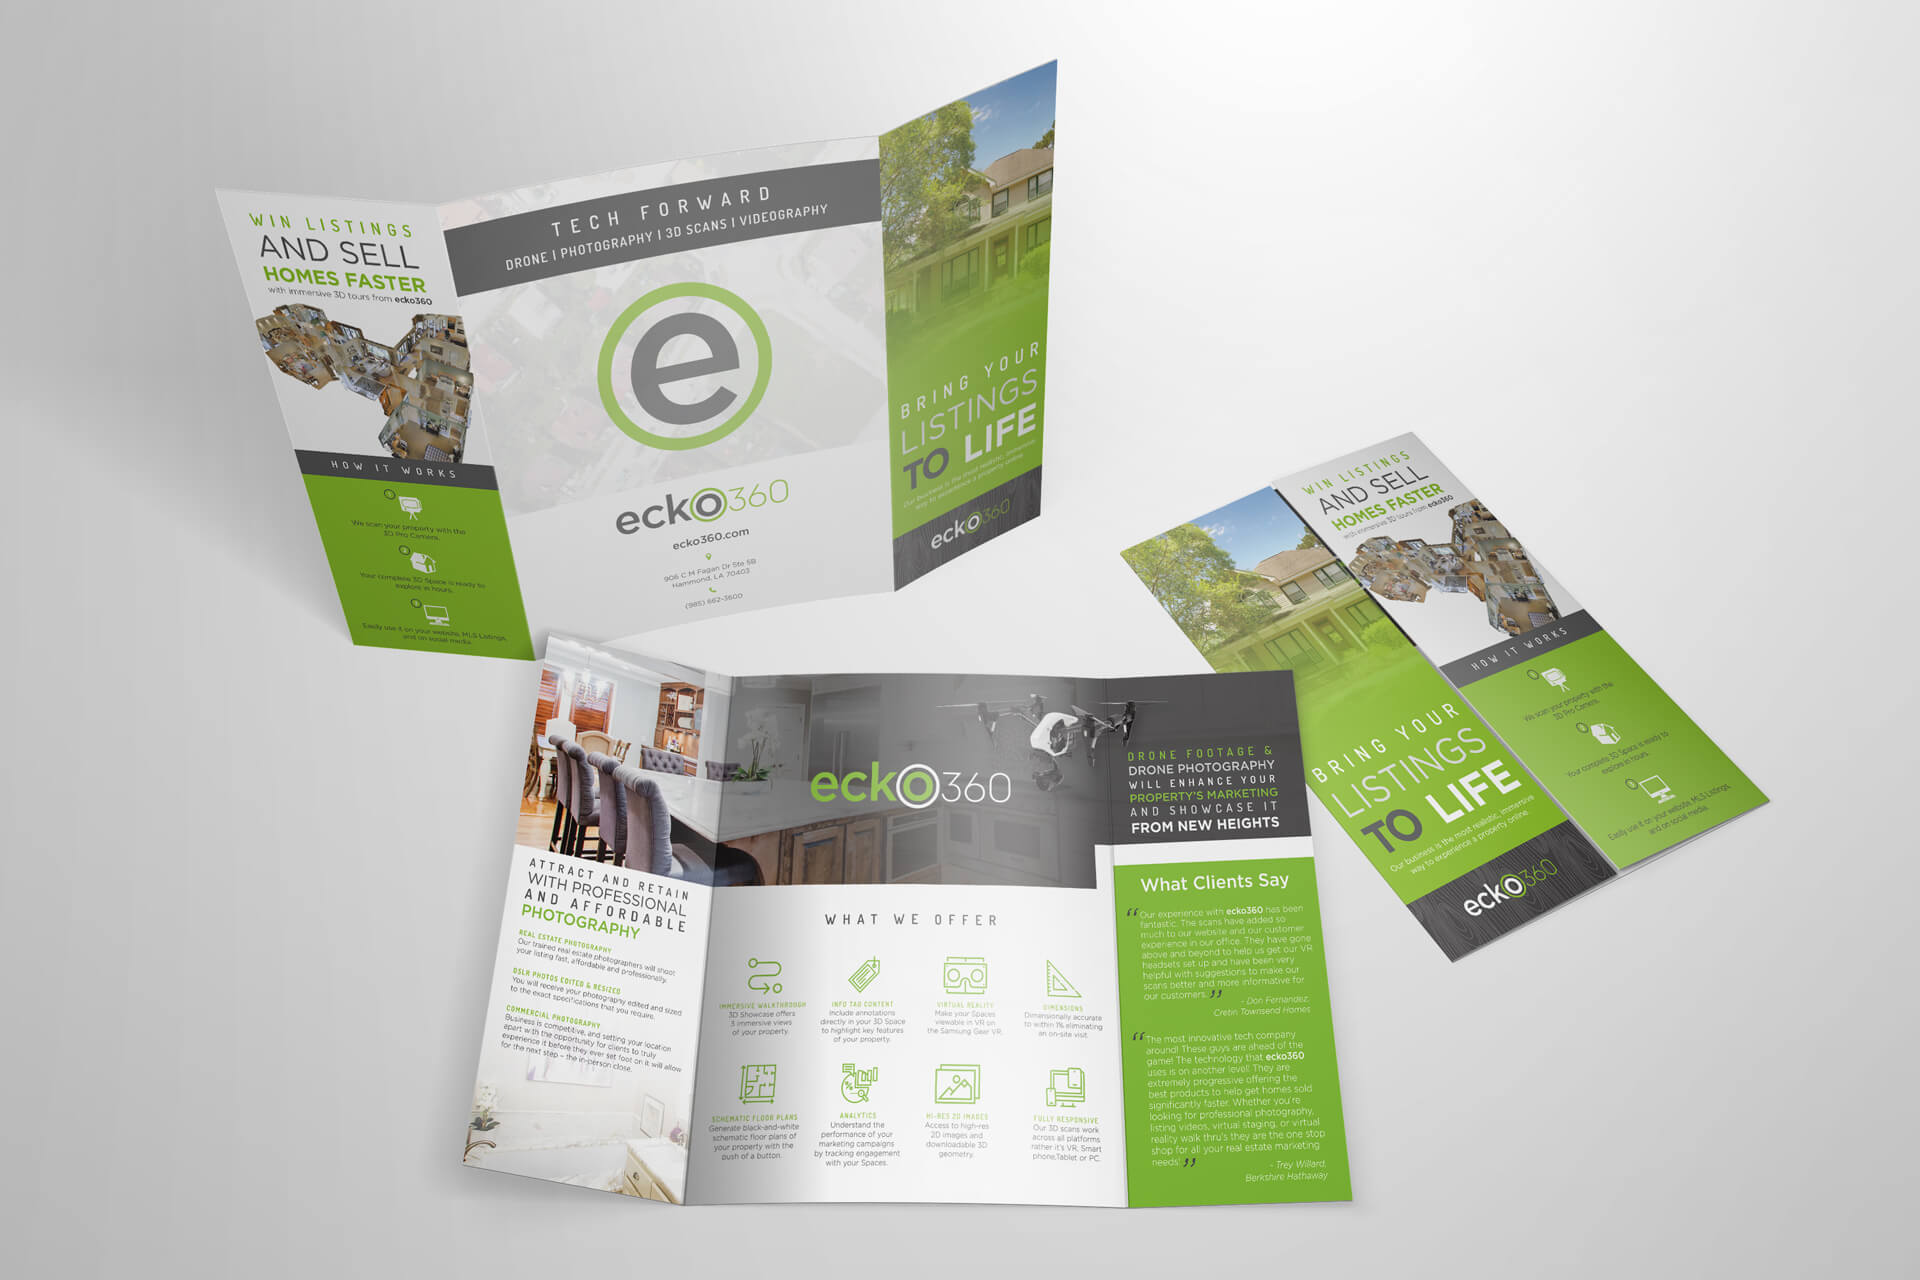 ecko360 Print Brochure